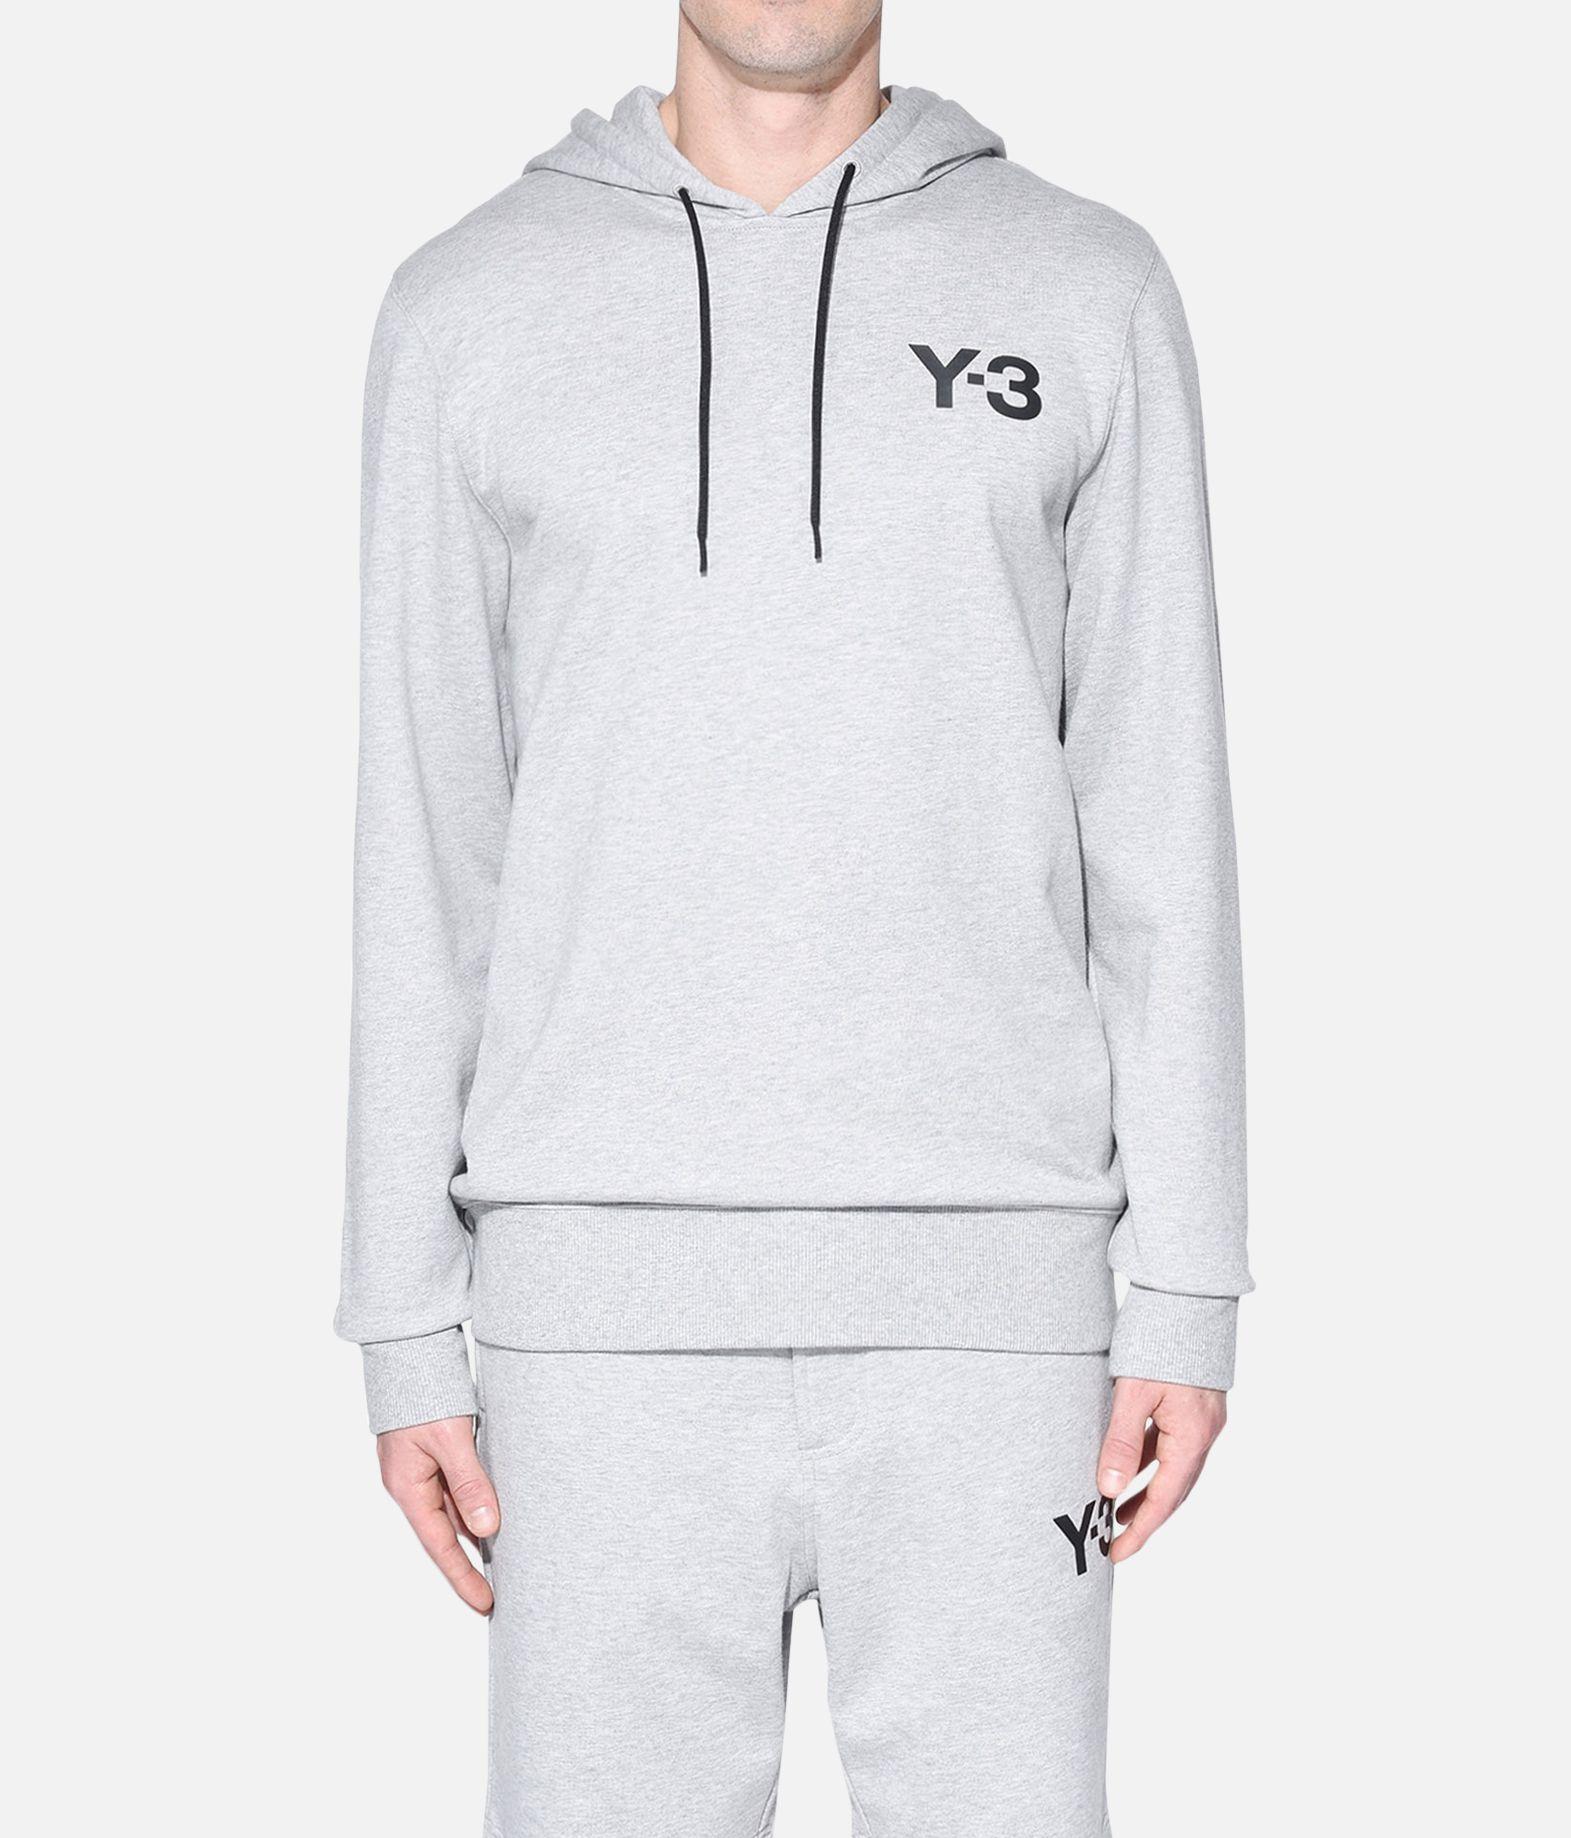 Y-3 Y-3 CLASSIC HOODIE Sweatshirt mit Kapuze Herren r